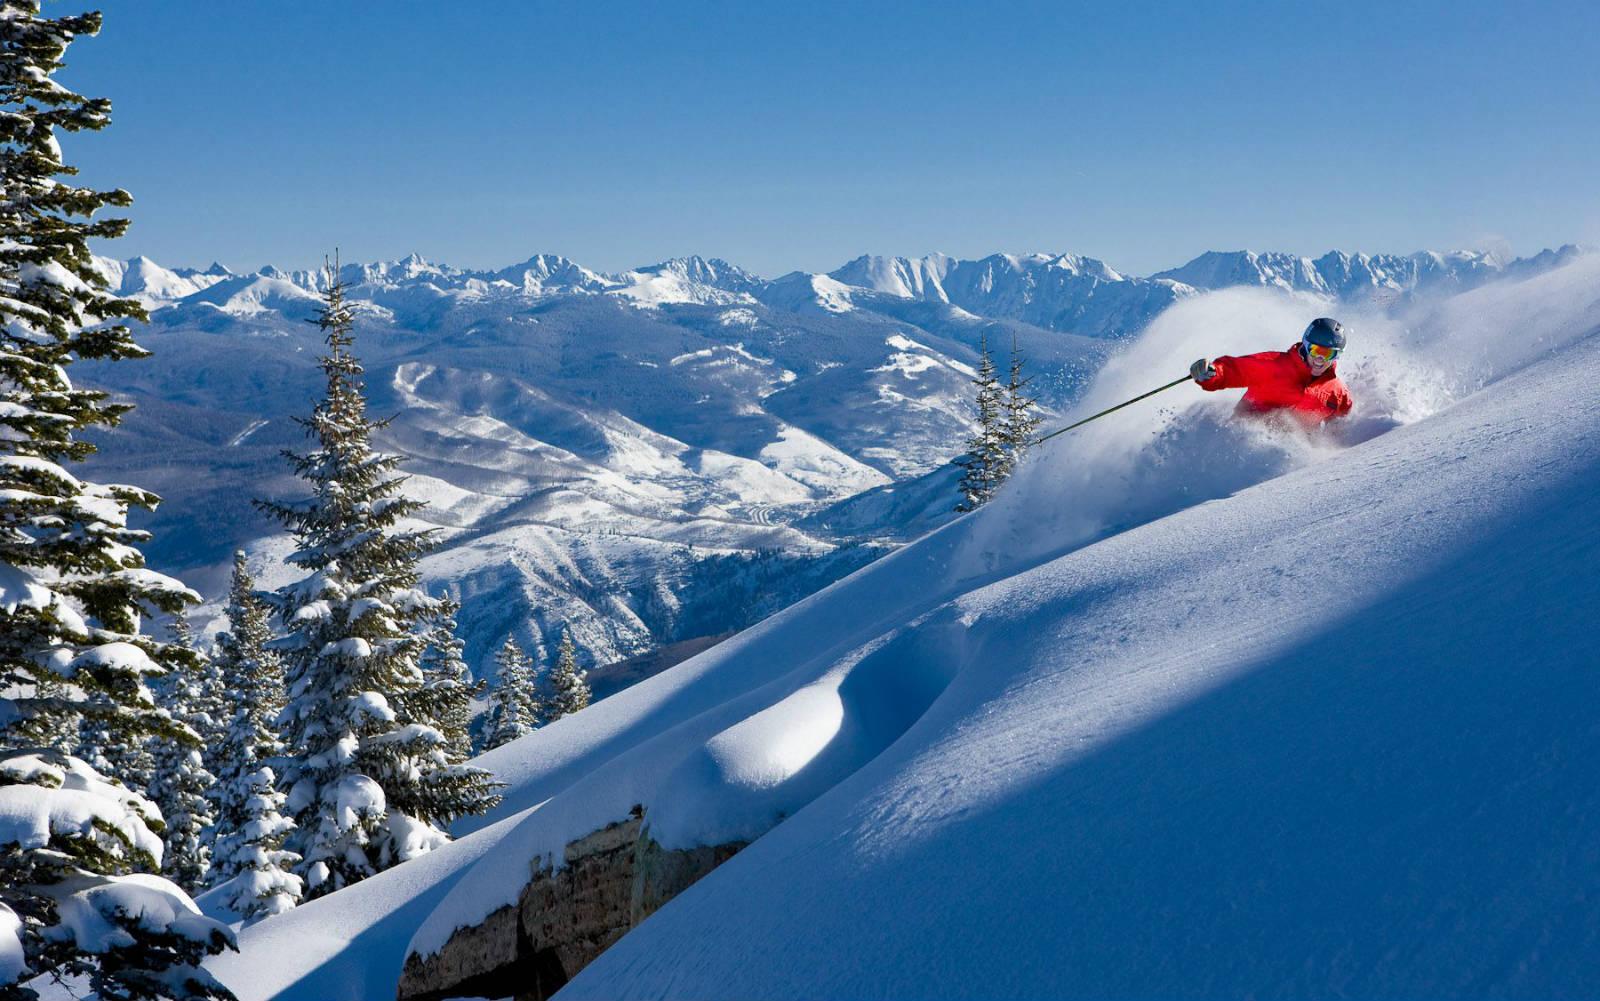 best skiing resort in colorado